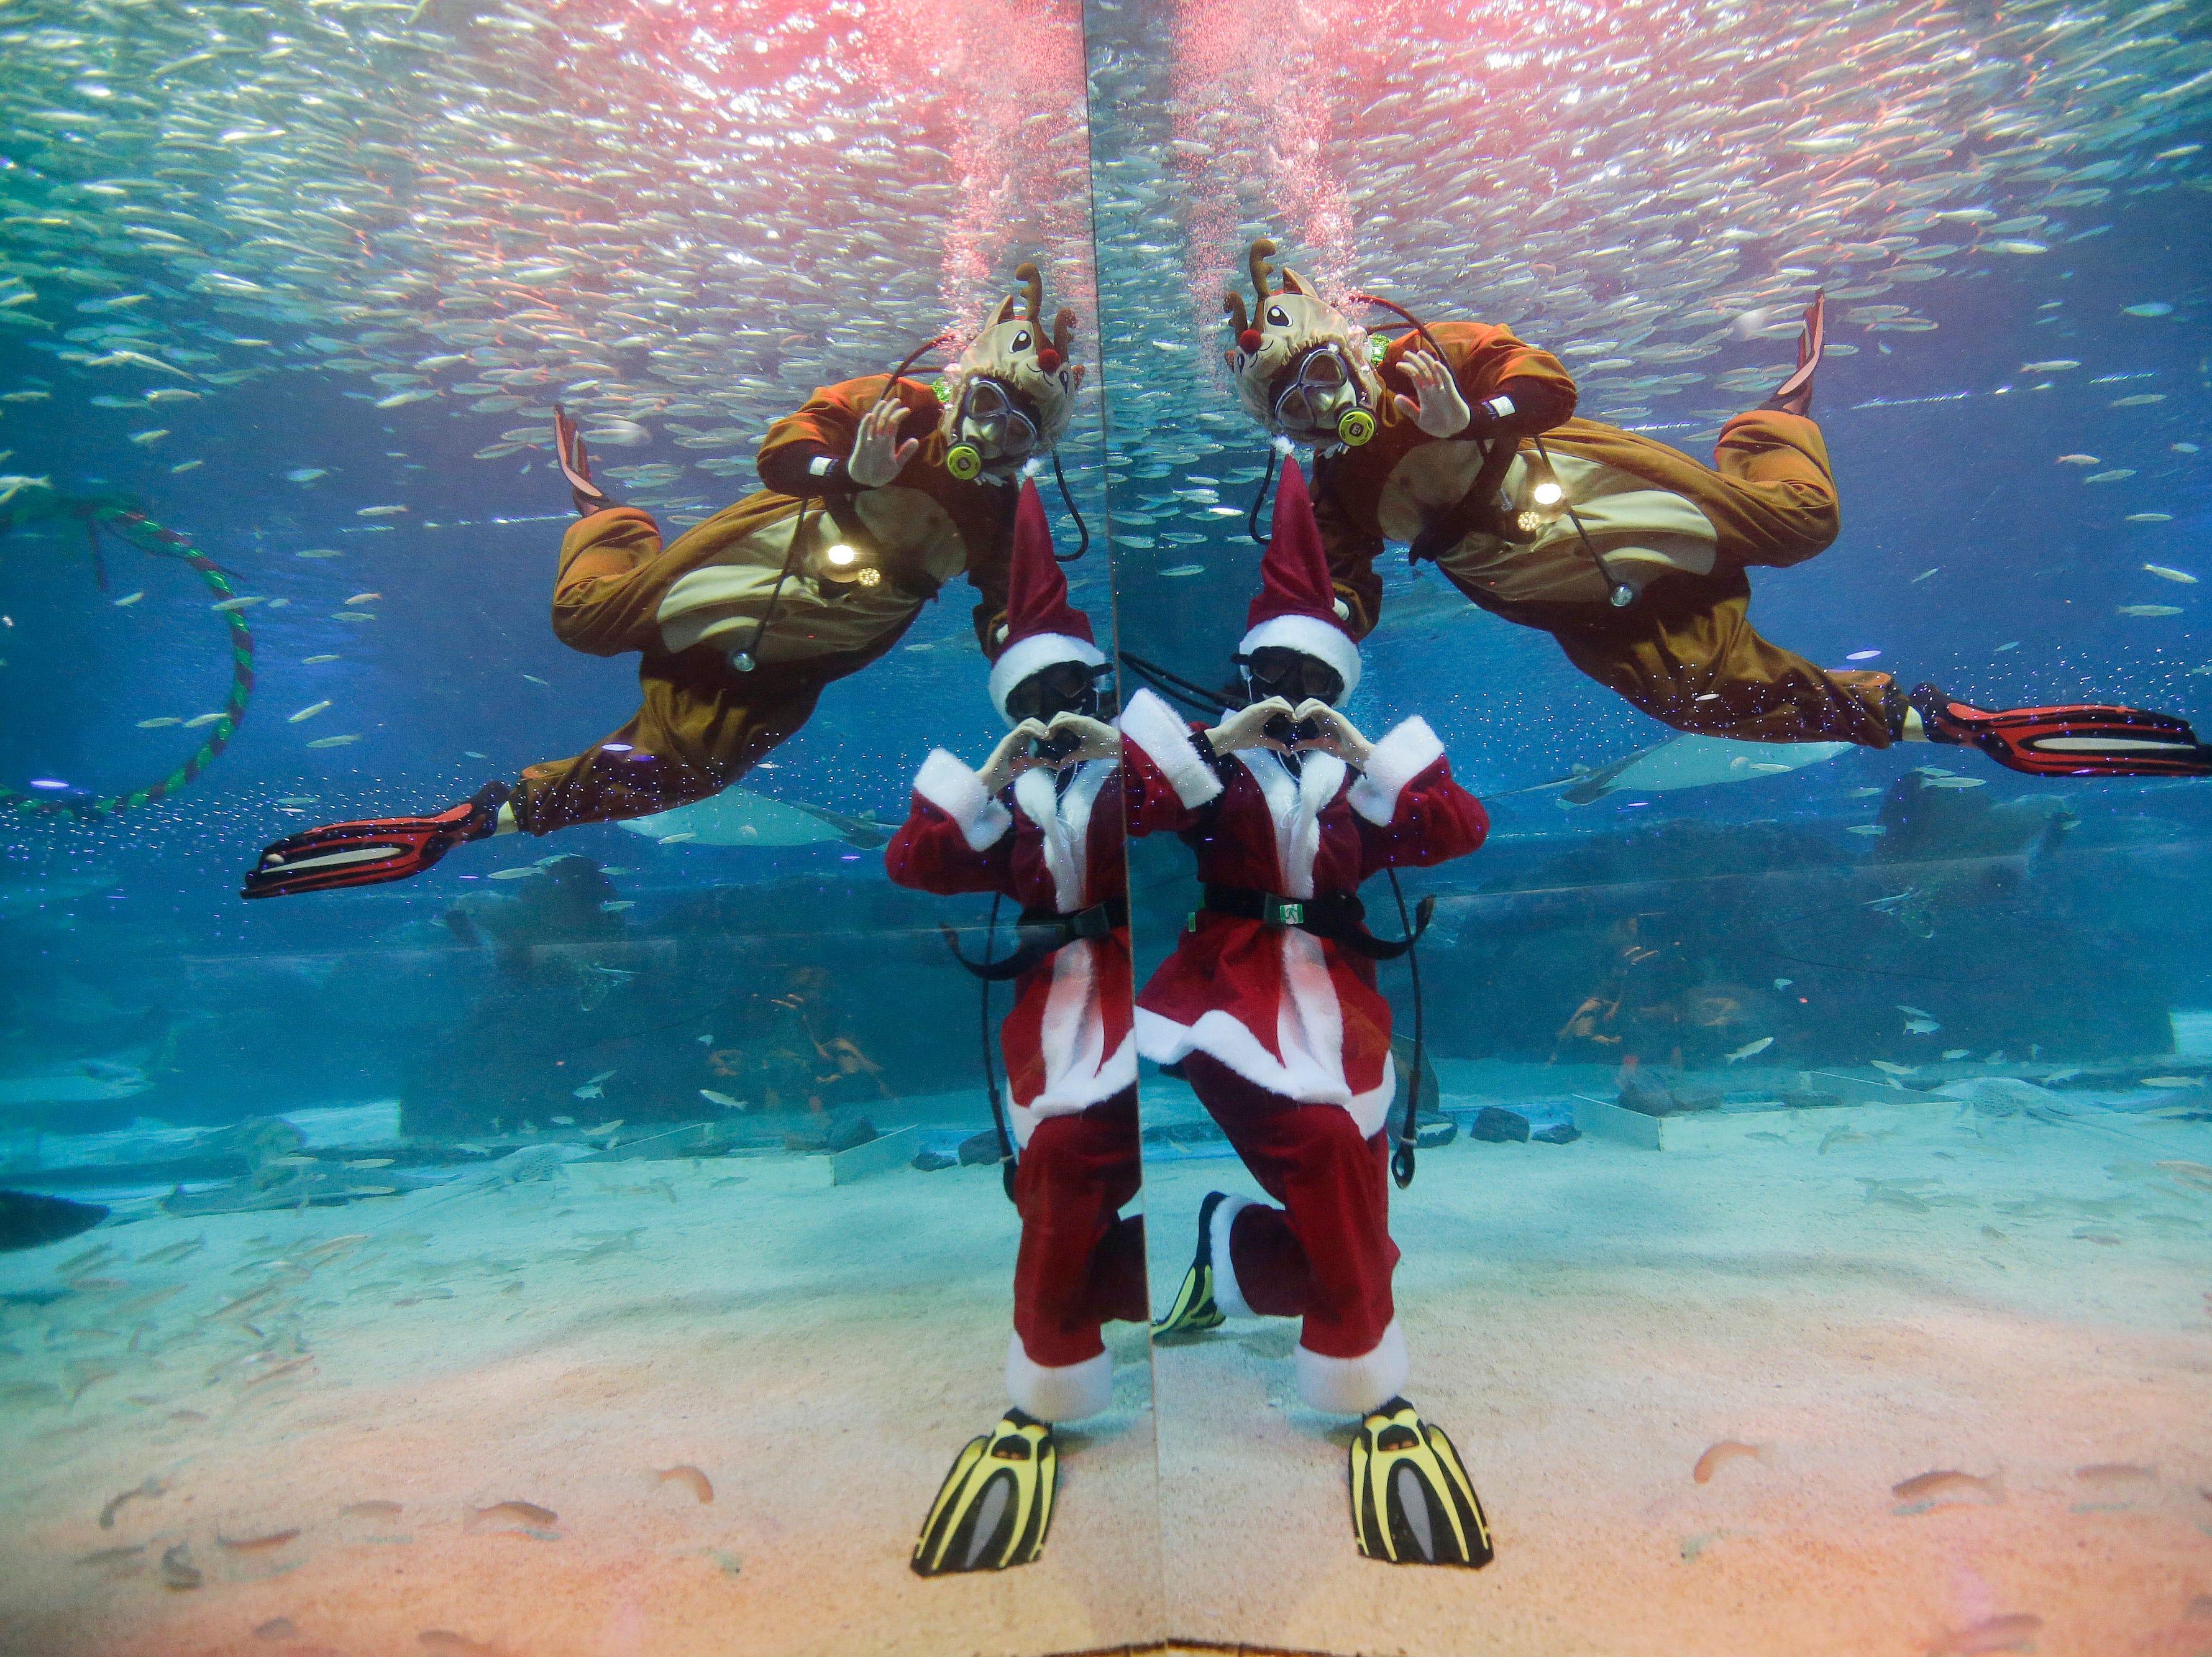 Divers dressed in Santa Claus and Rudolph costumes perform at the Coex Aquarium in Seoul, South Korea, Tuesday, Dec. 18, 2018.